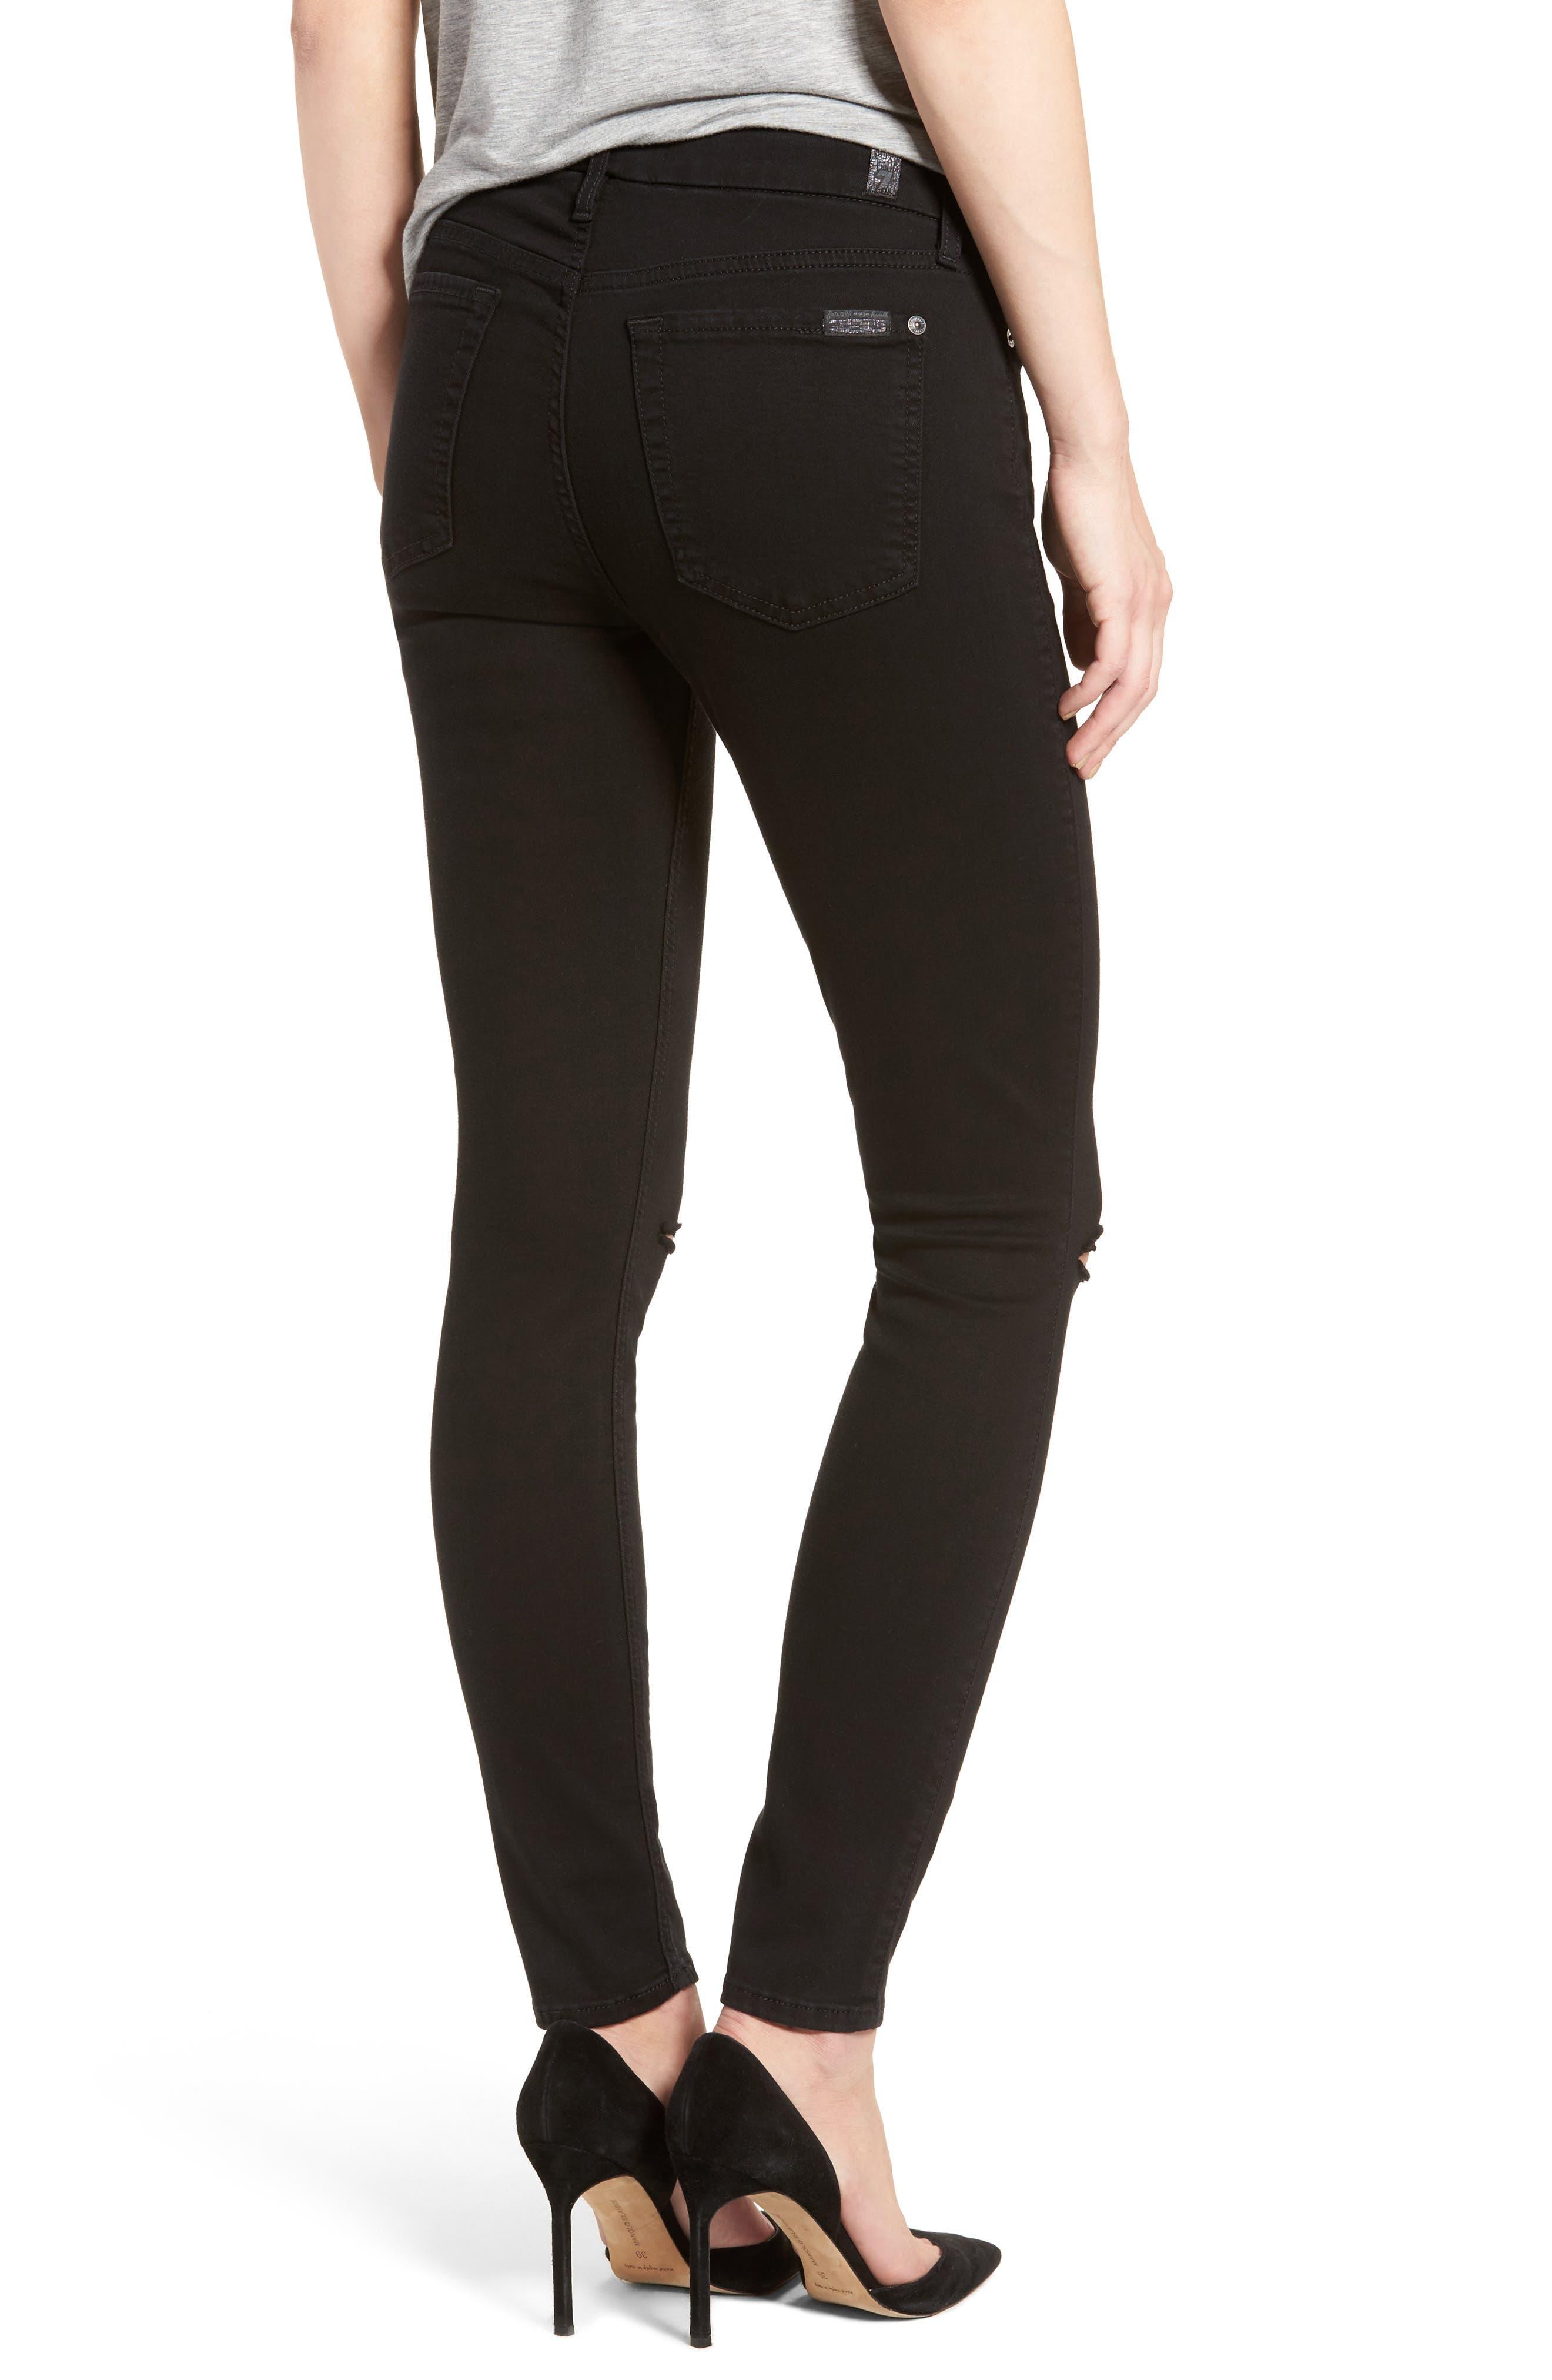 b(air) Ankle Skinny Jeans,                             Alternate thumbnail 2, color,                             BAIR BLACK 2